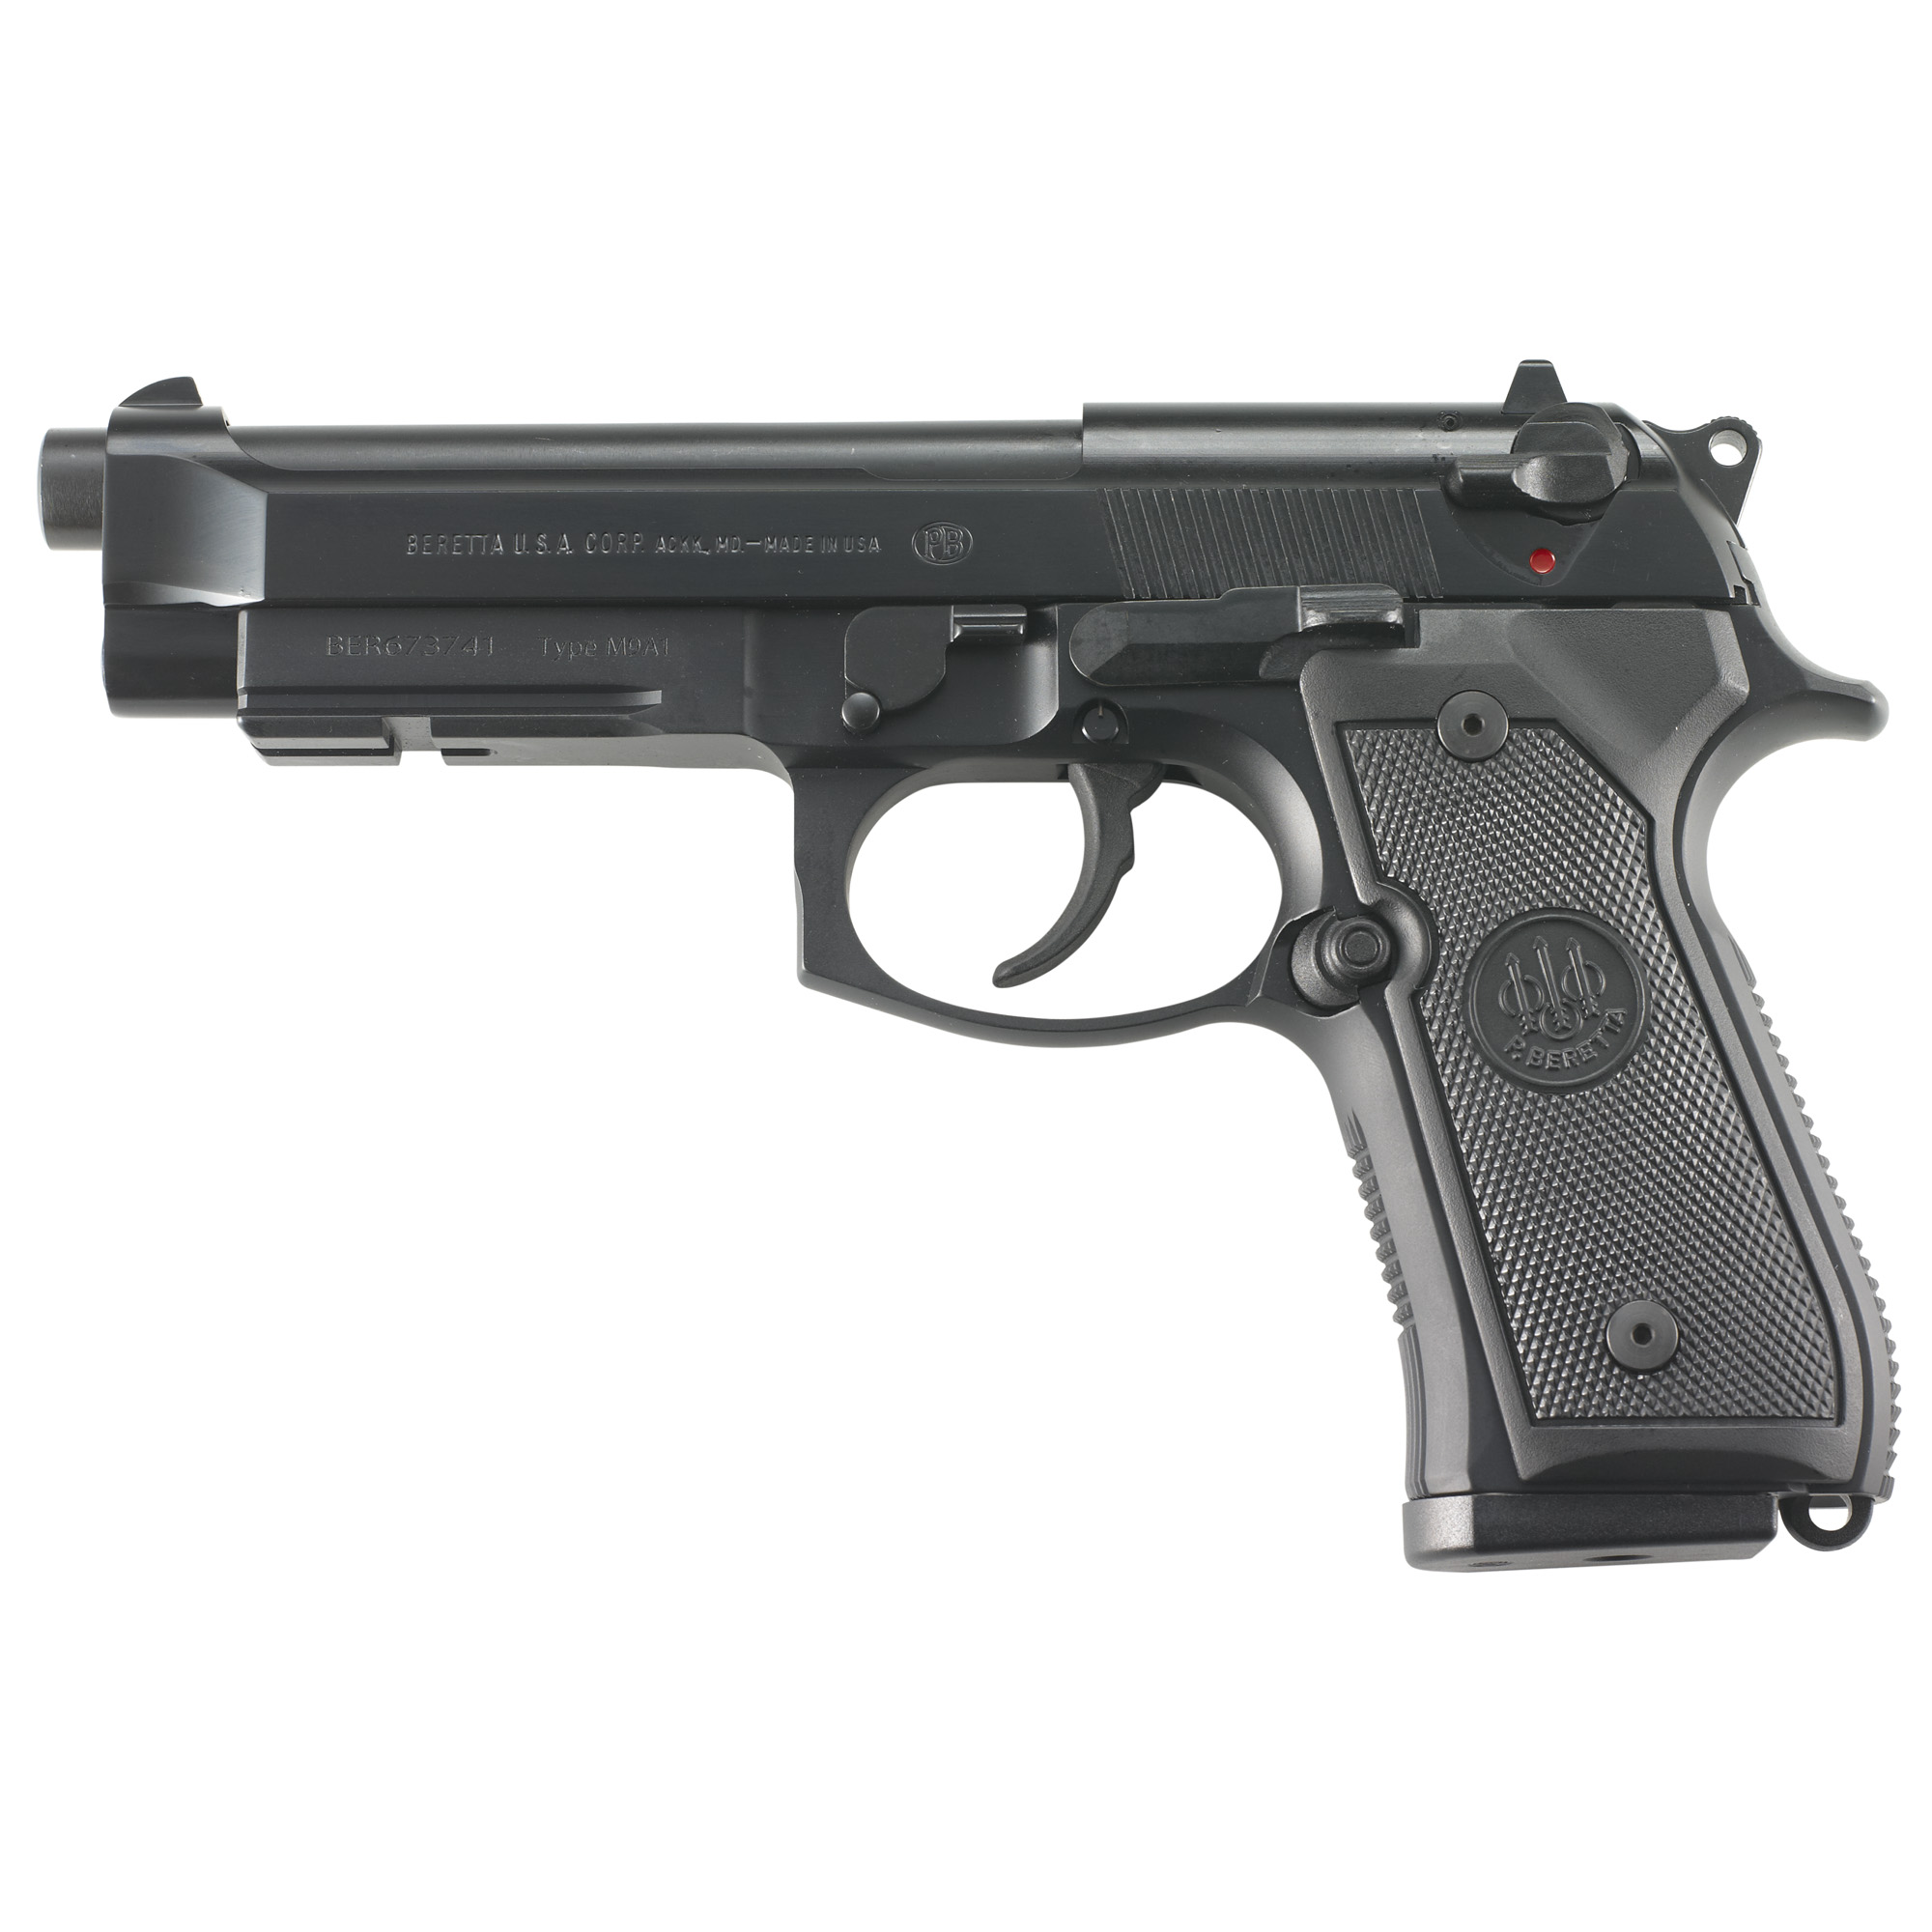 "Beretta M9a1 Ca 9mm 4.9"" 10rd Blk"